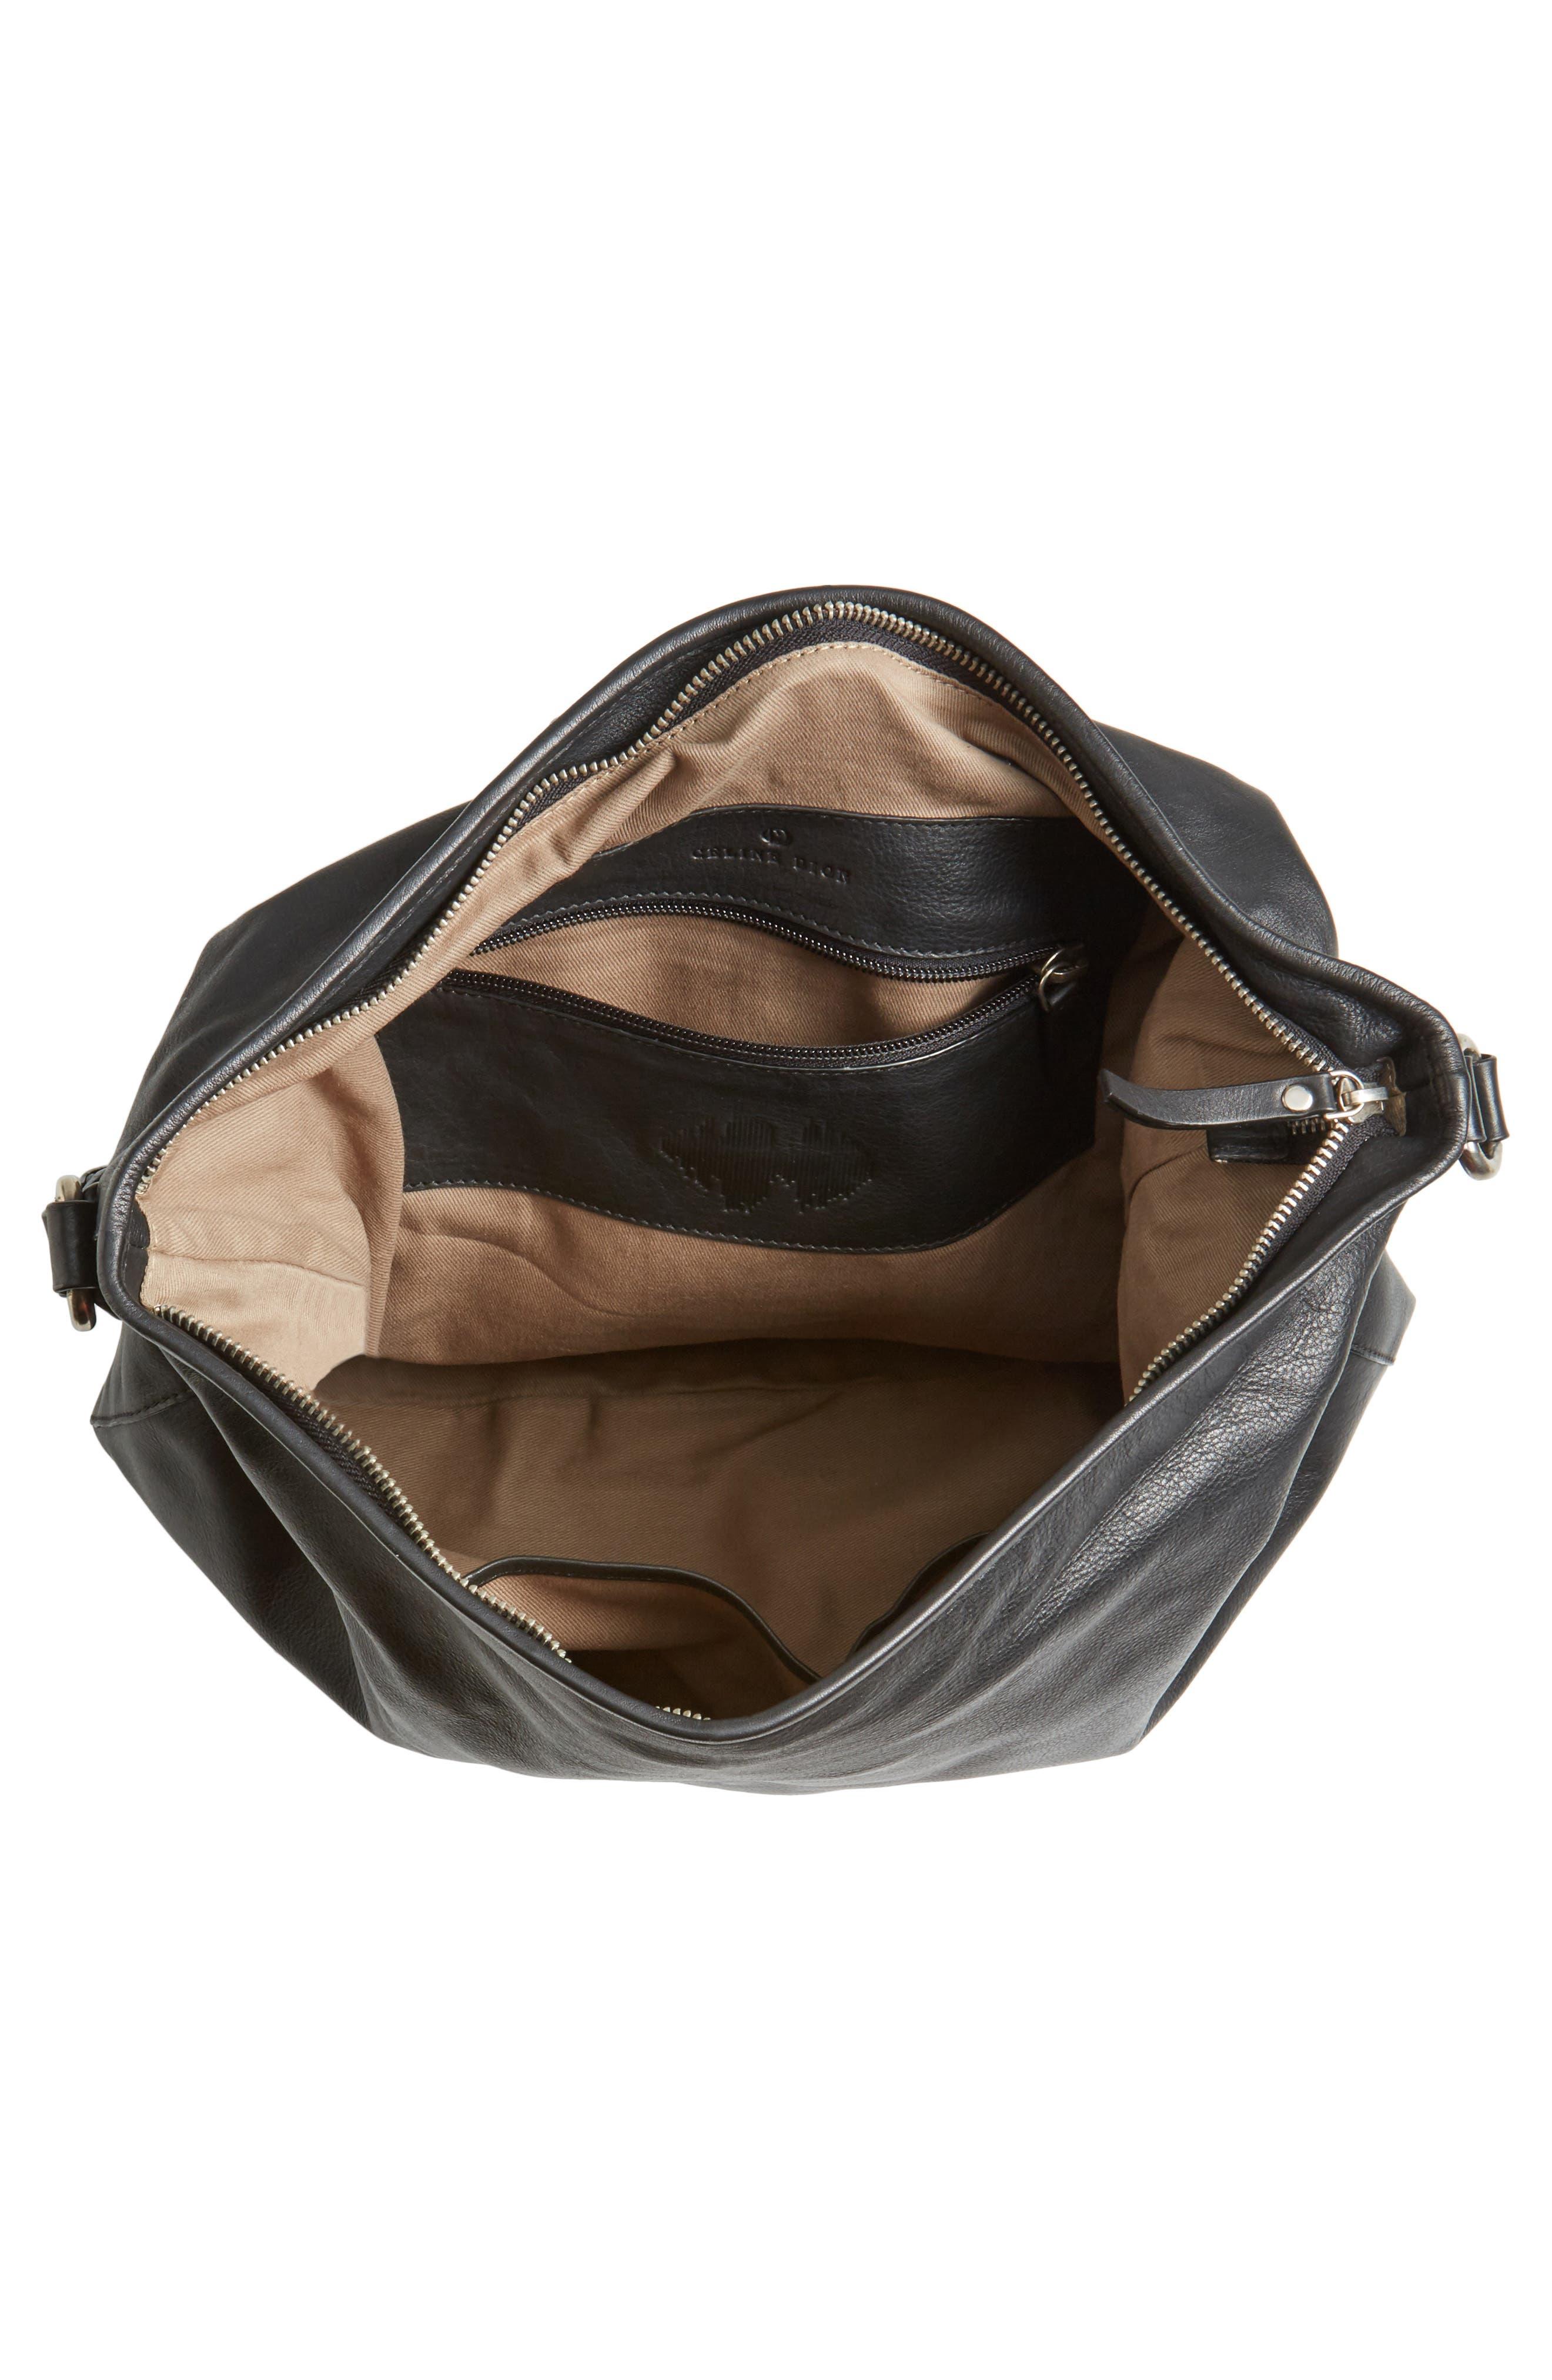 Céline Dion Cadence Leather Hobo Bag,                             Alternate thumbnail 4, color,                             001